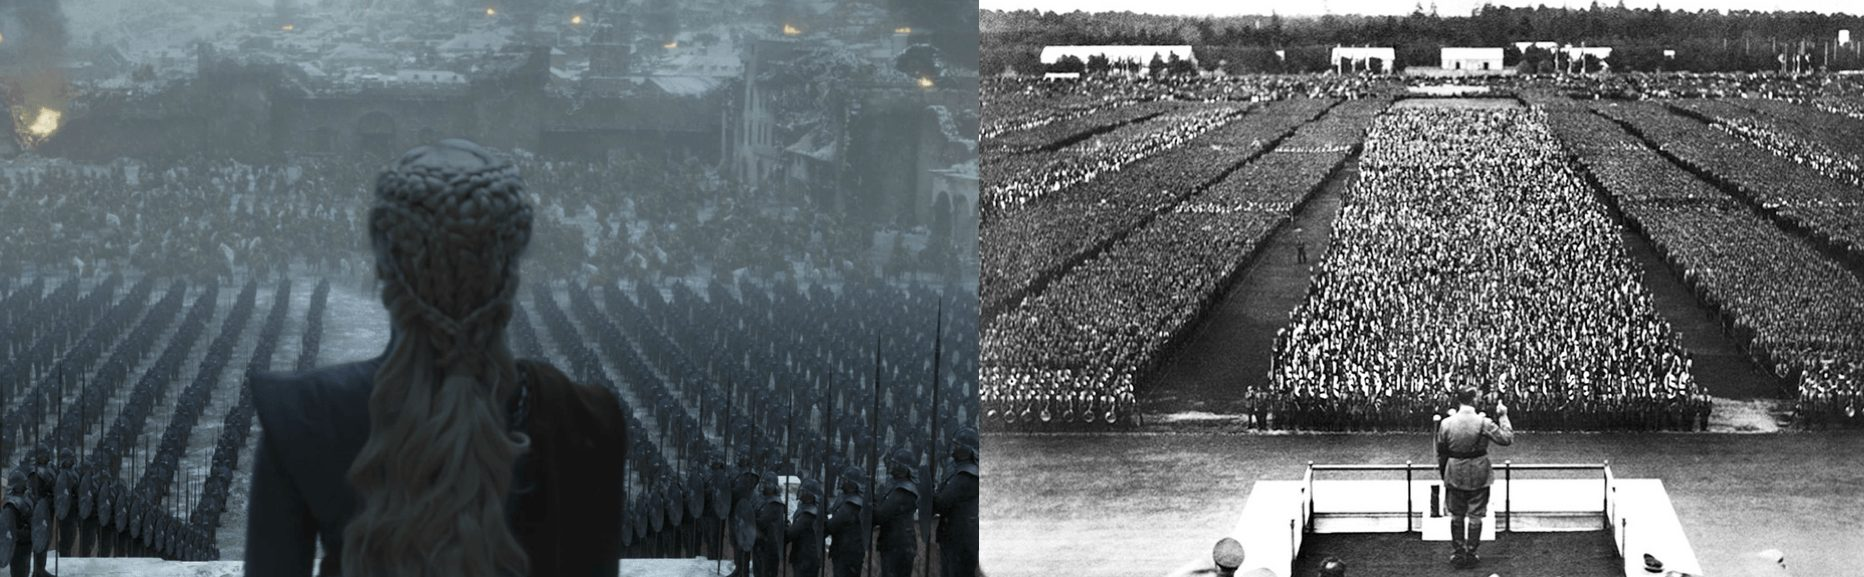 Dany Hitler comparison